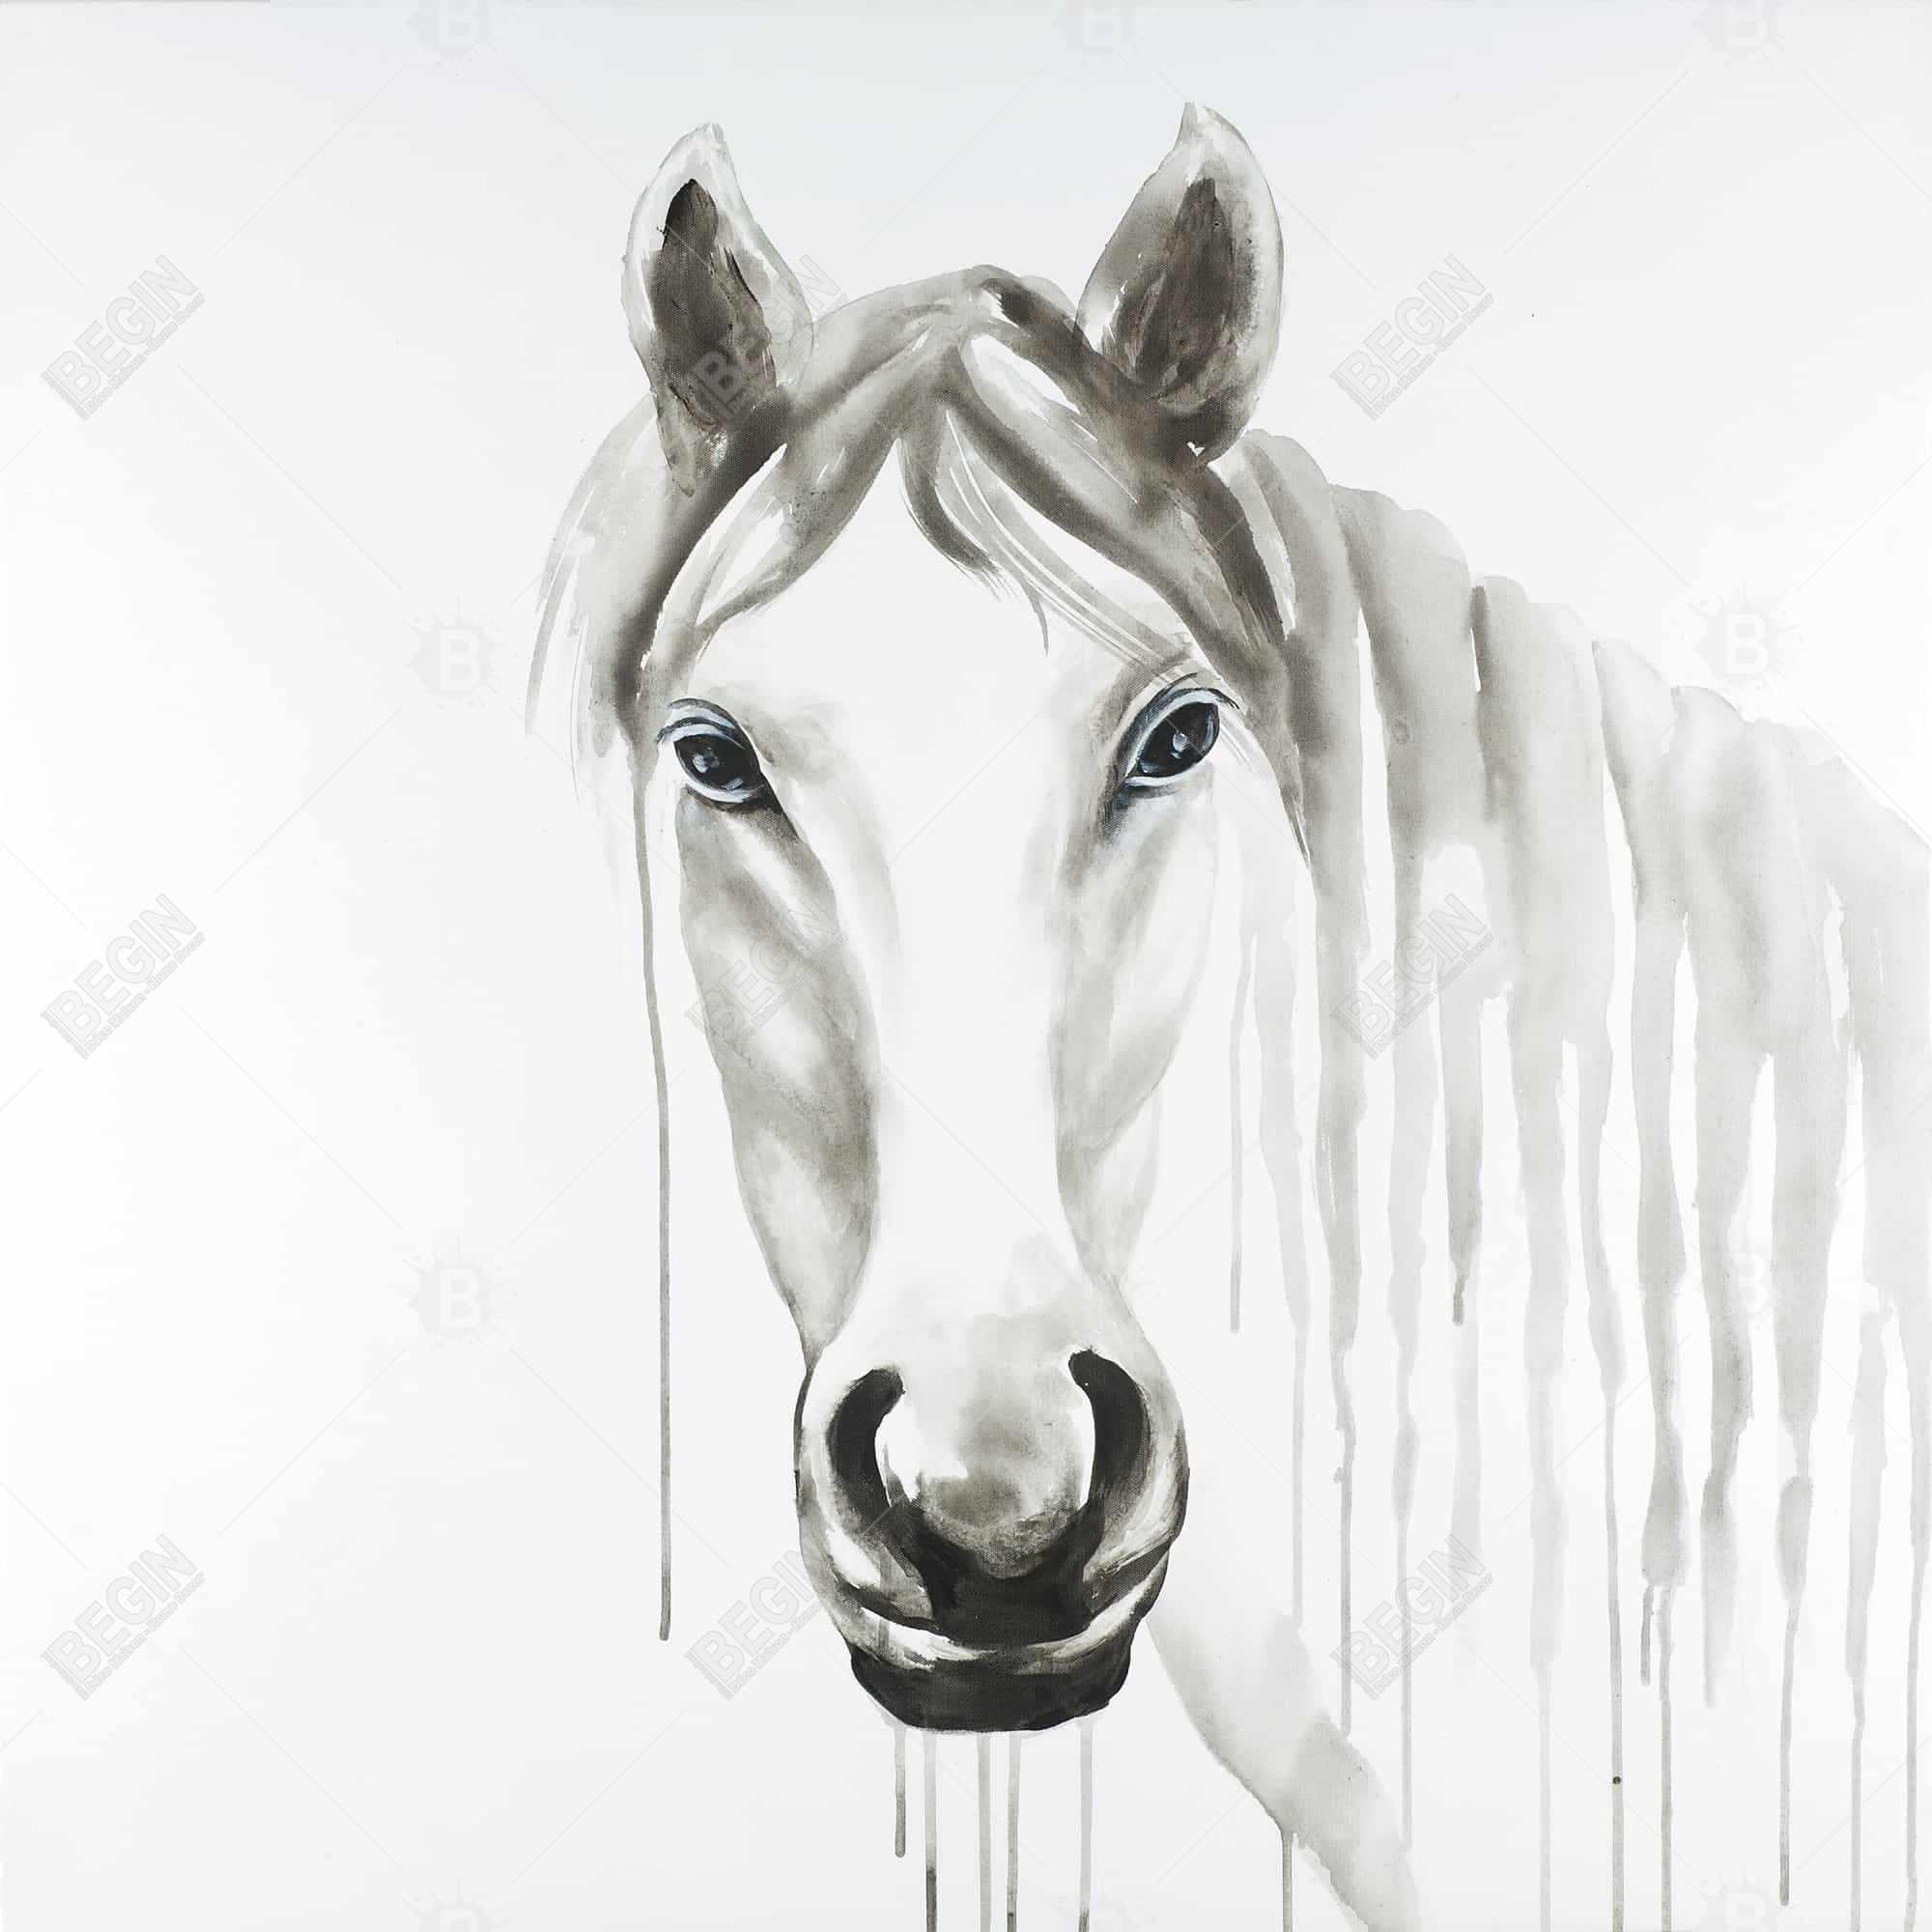 Solitary white horse